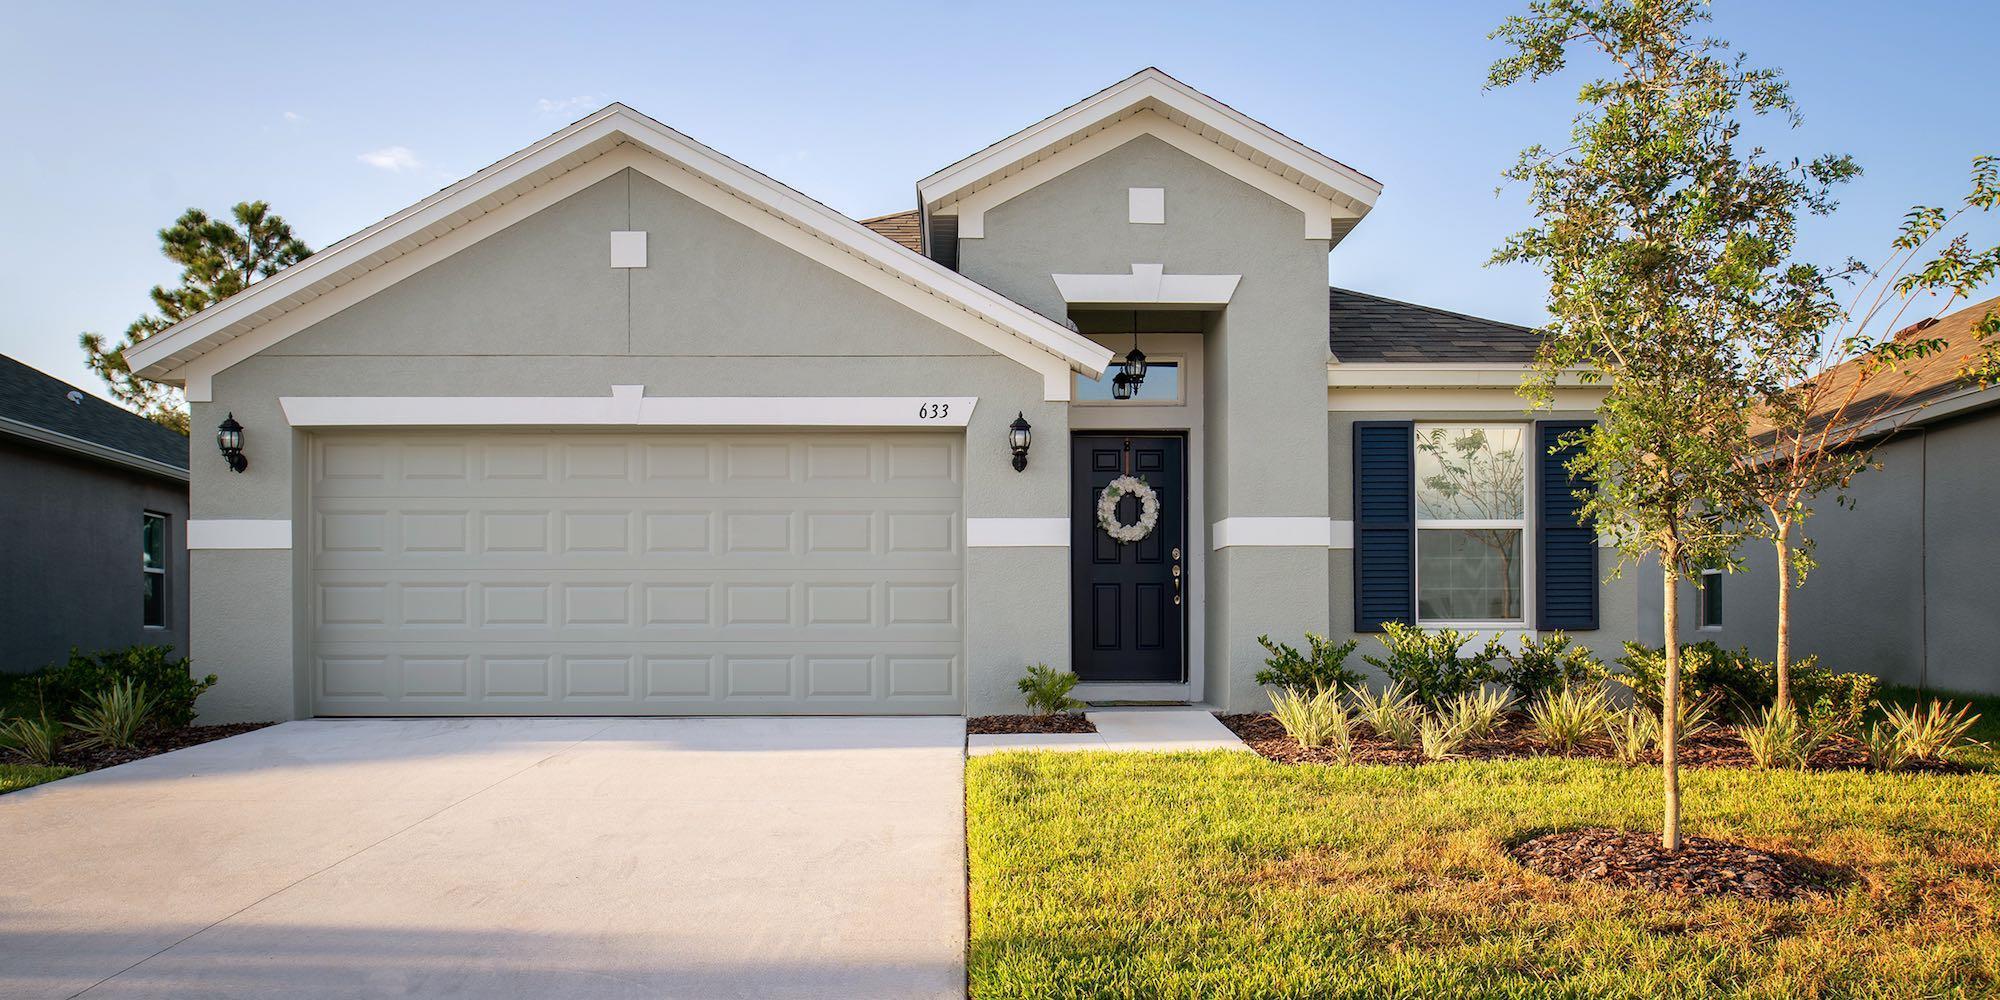 New Homes in Hernando County   125 Communities   NewHomeSource